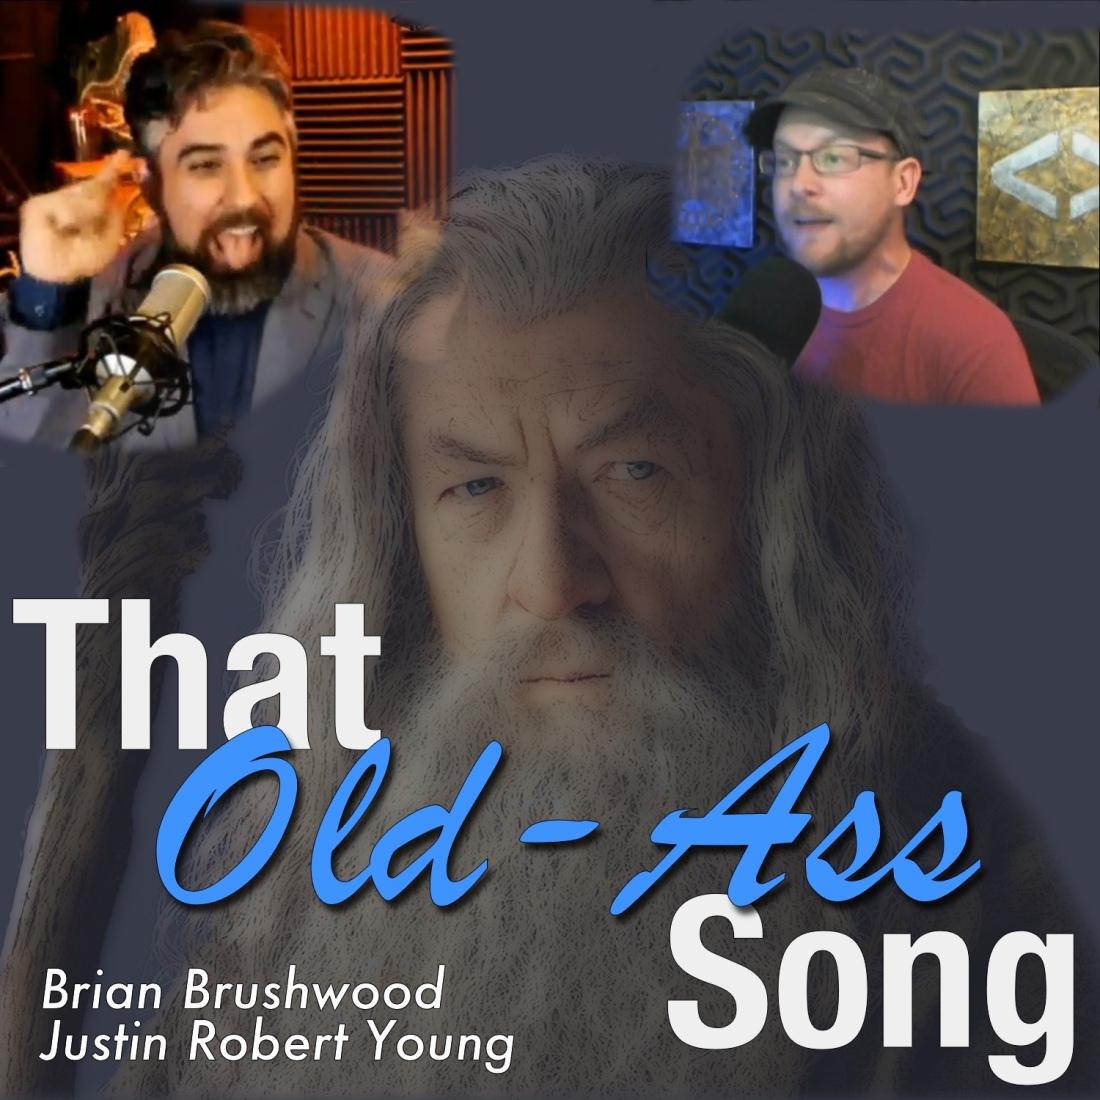 old-ass-song-arts-as-jpeg